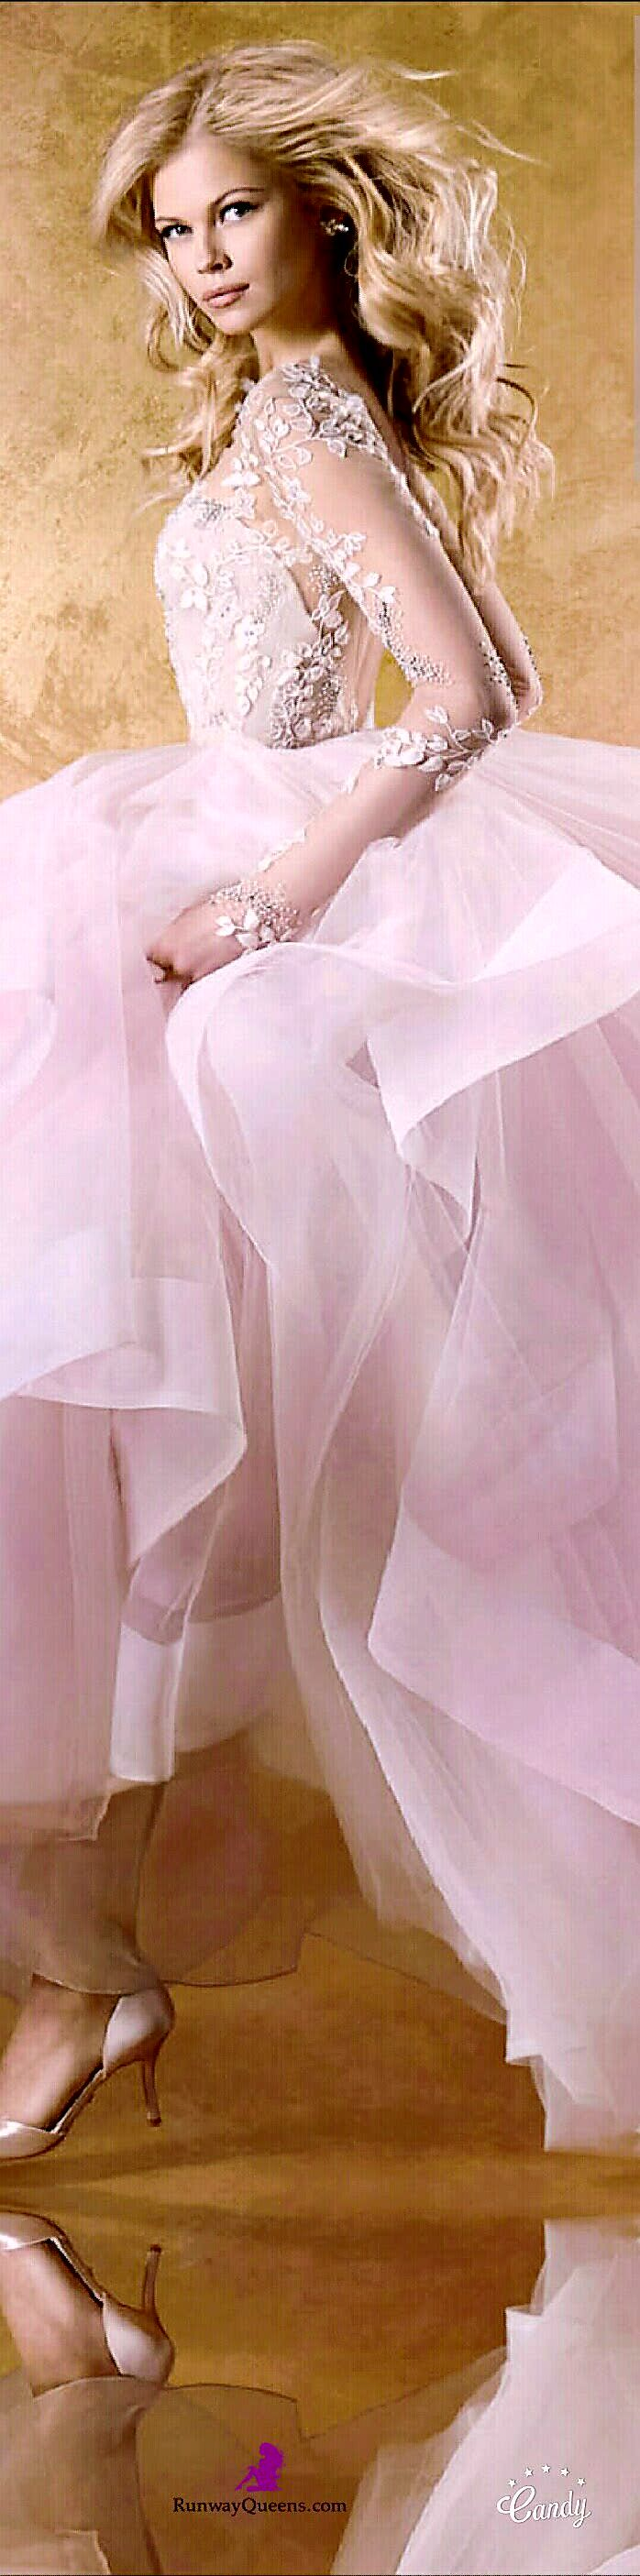 Hailey Paige, Fashion 2017, pink